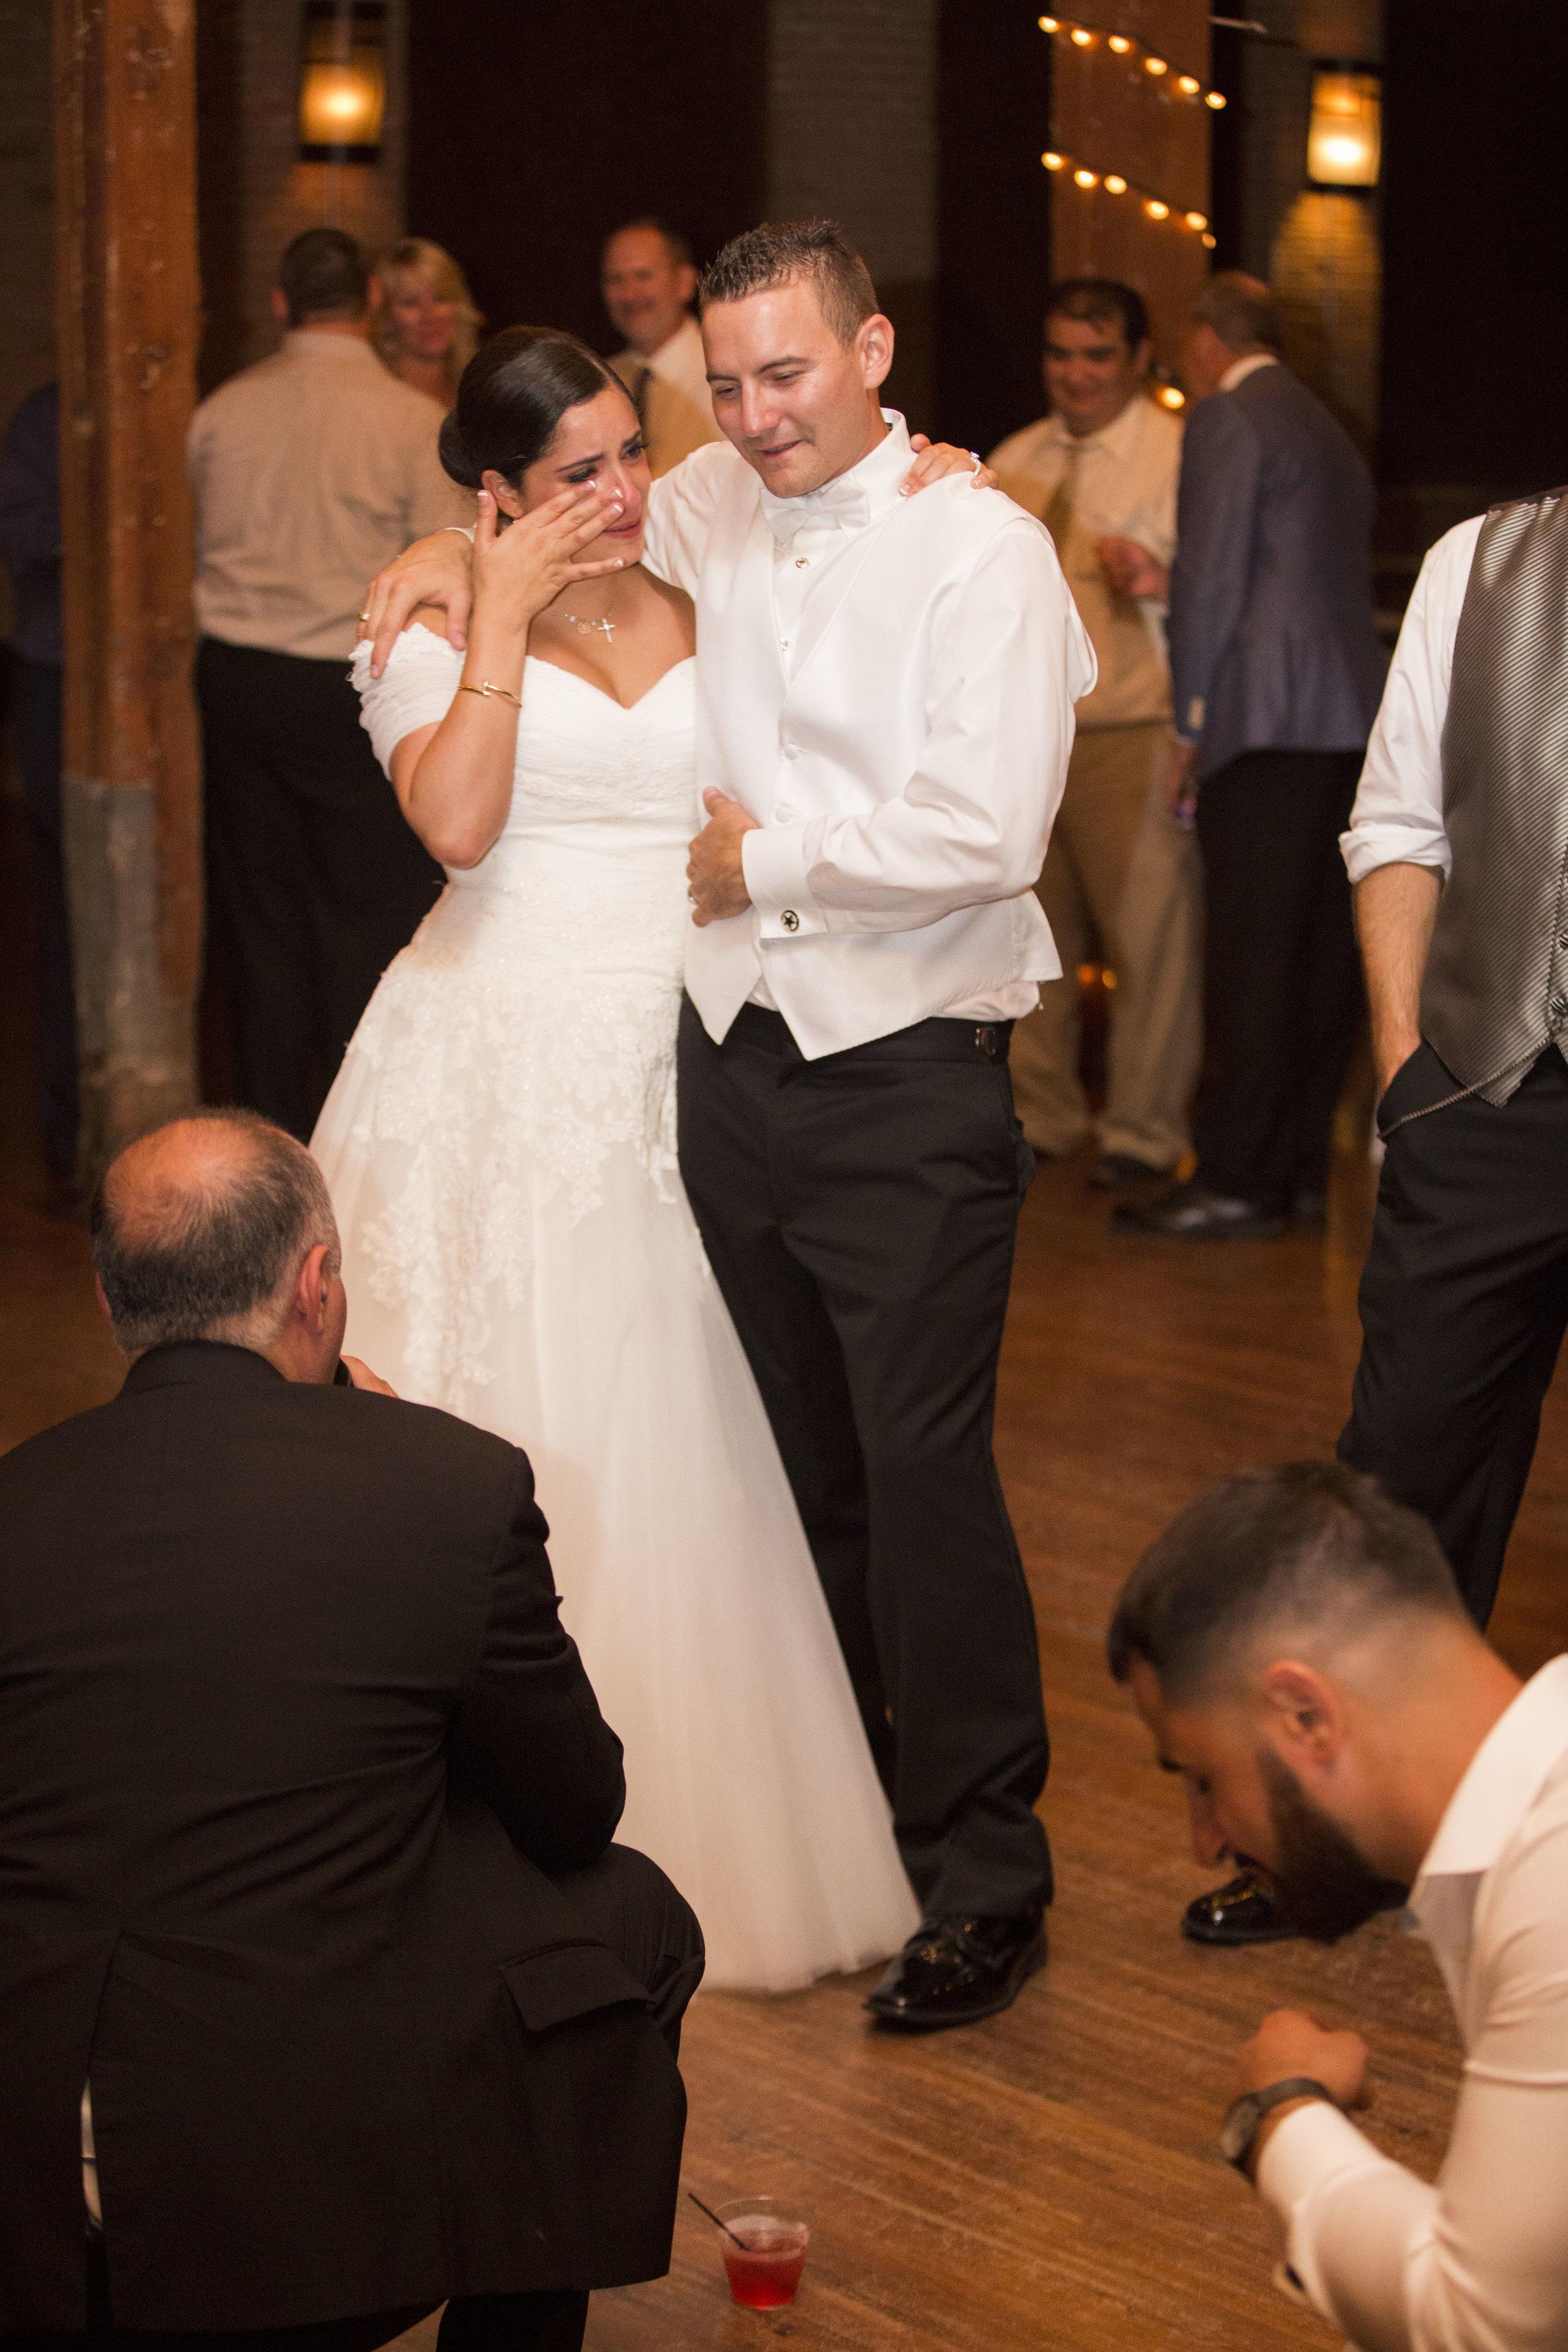 ATGI_Magali & Josh Wedding1_2S8A3020.jpg